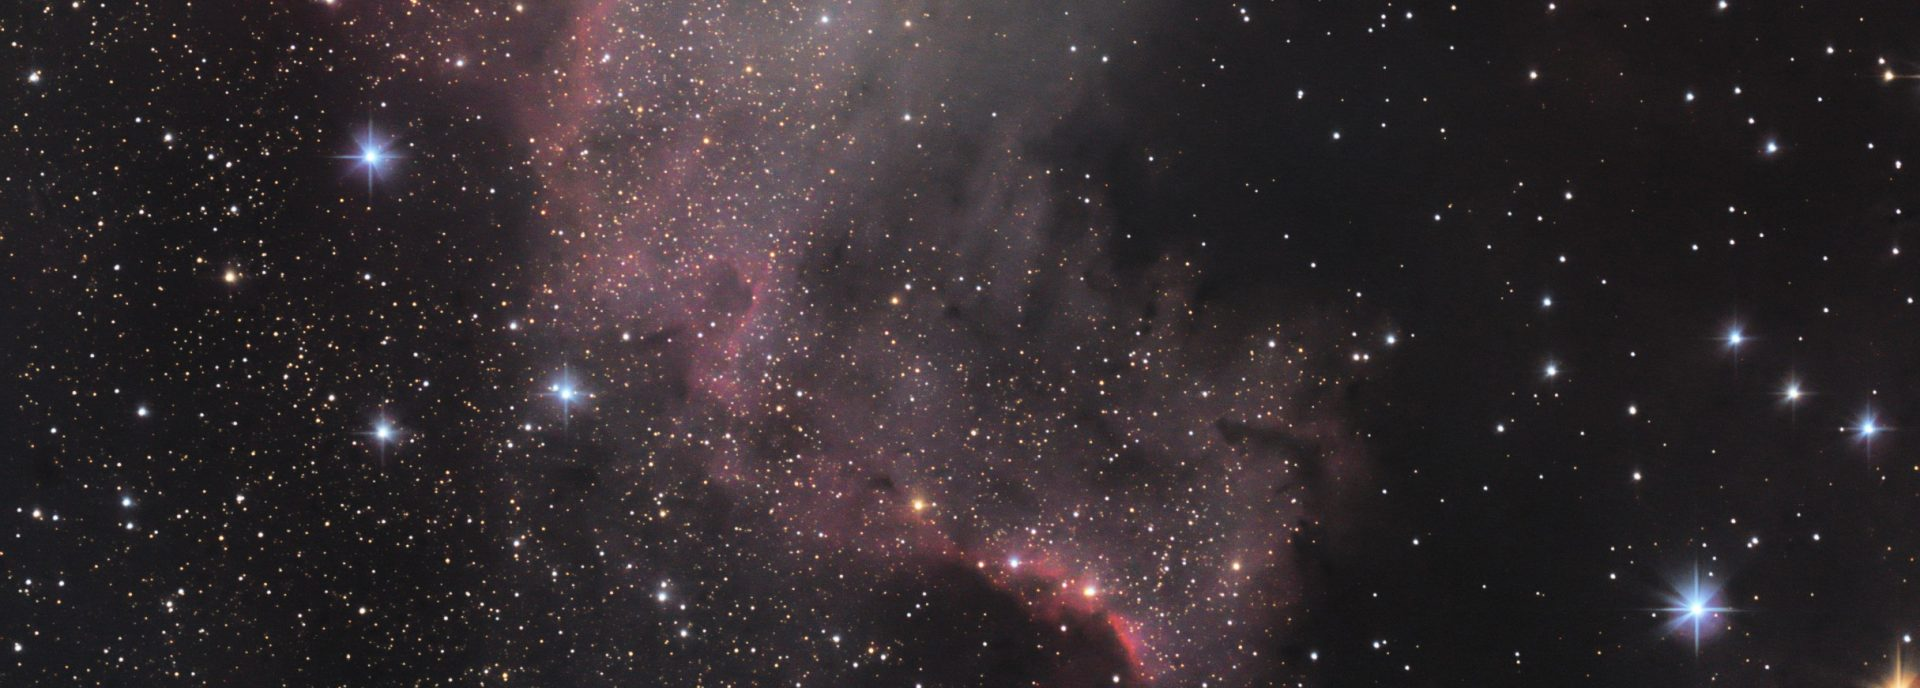 _darkSkies Astrophotography